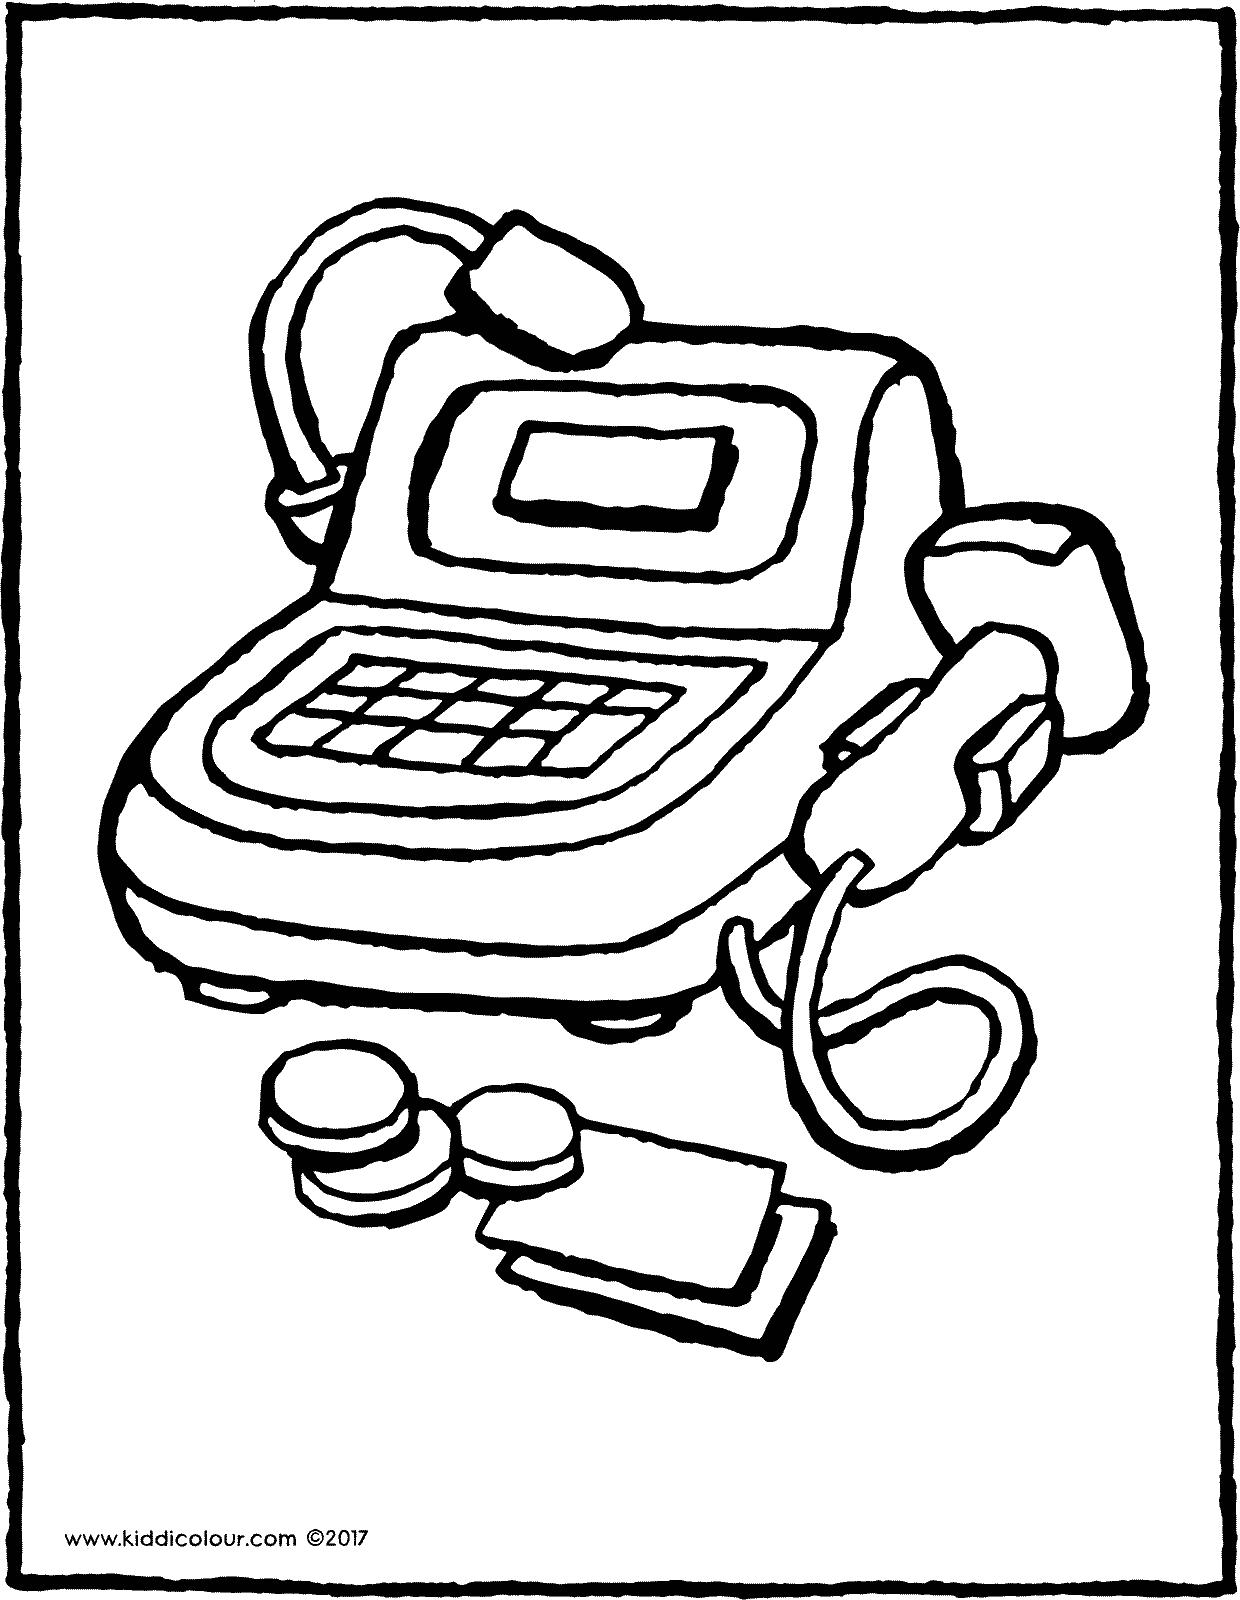 1240x1600 Toy Cash Register